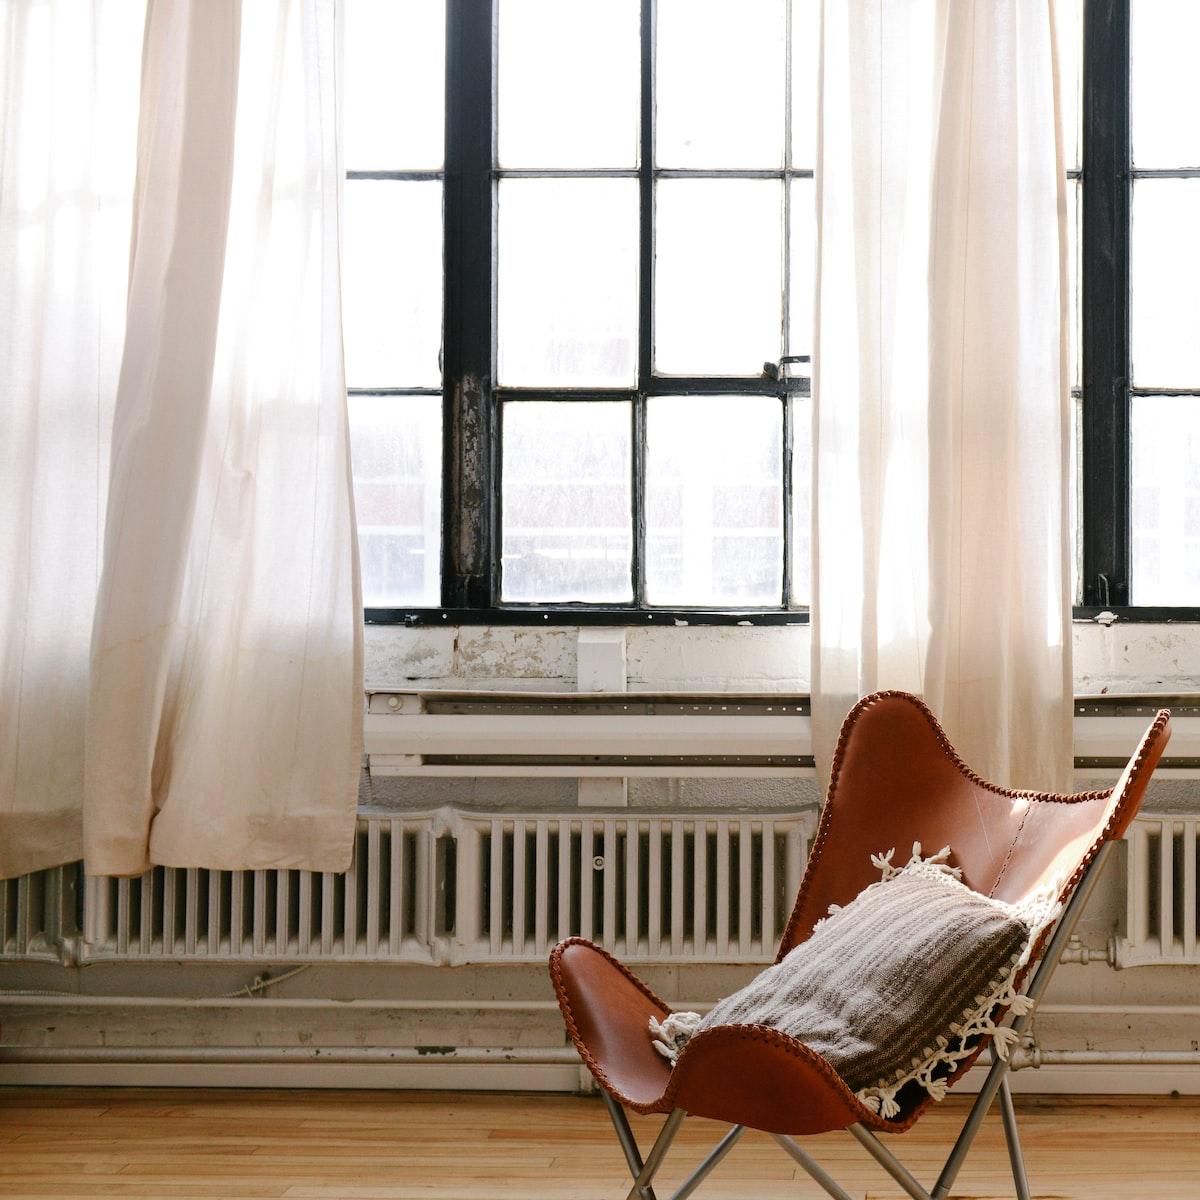 die 10 besten heizung witze schlechte witze. Black Bedroom Furniture Sets. Home Design Ideas